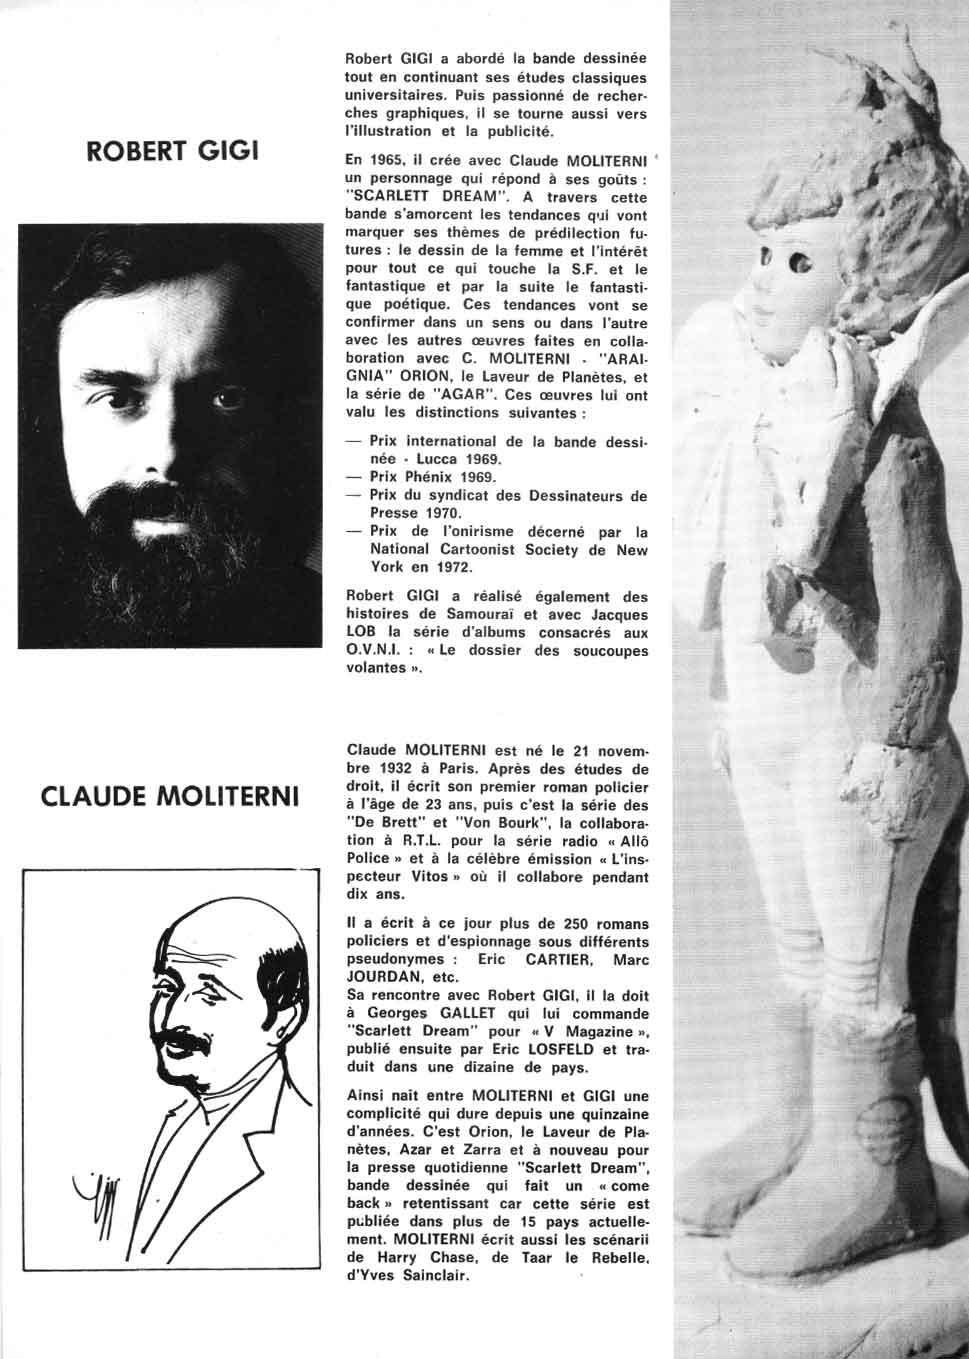 Sculpture Agar Dossier de presse Dargaud.